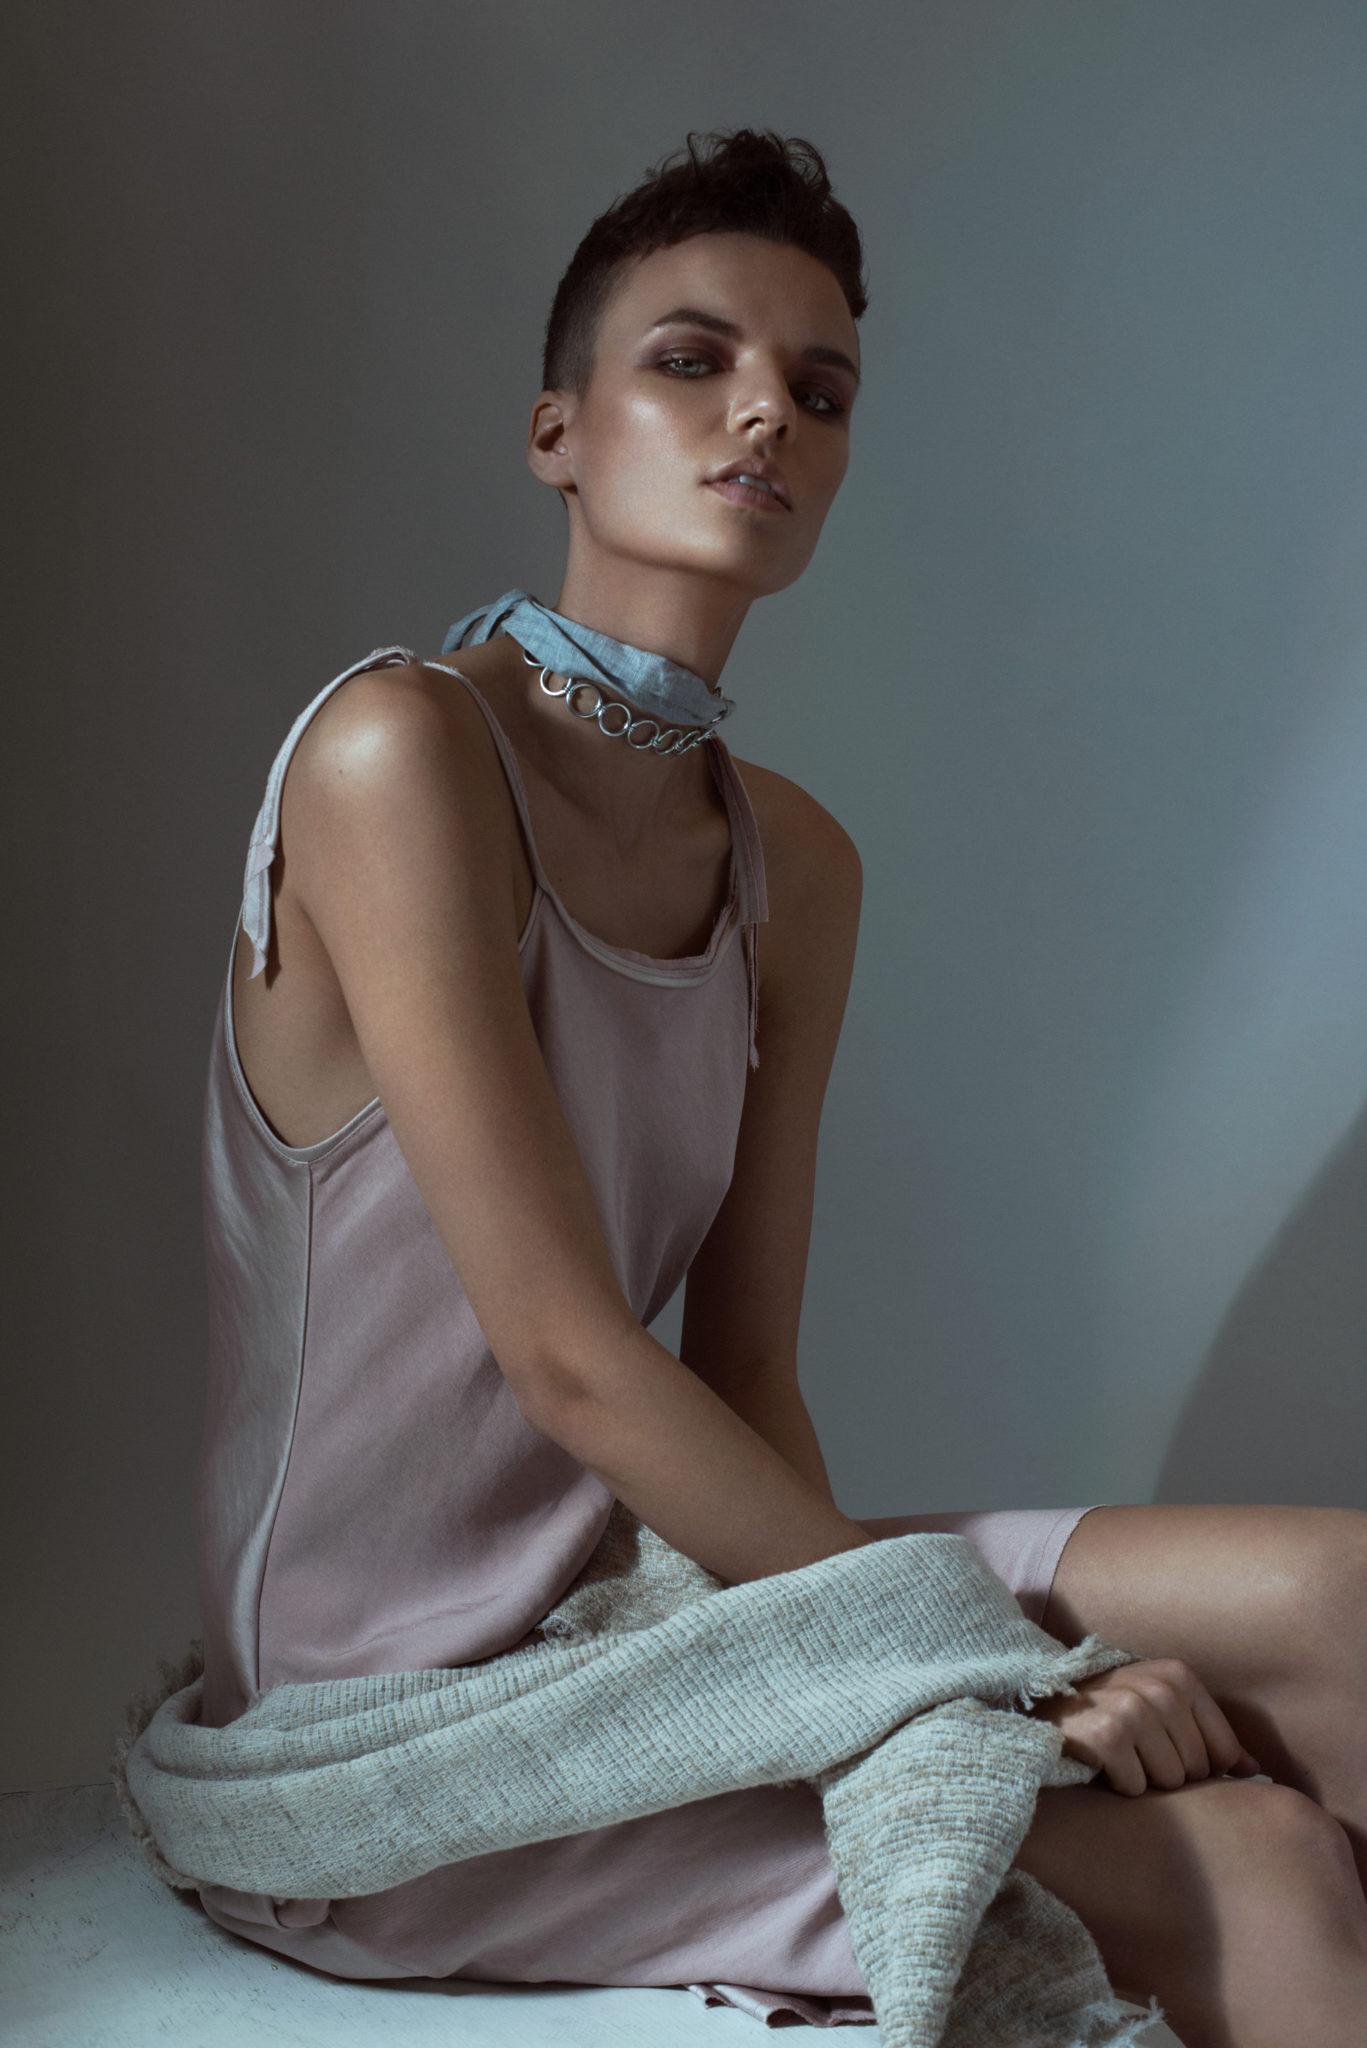 fashion story editorial webditorial le dernier etage magazine webzine on my own tina picard